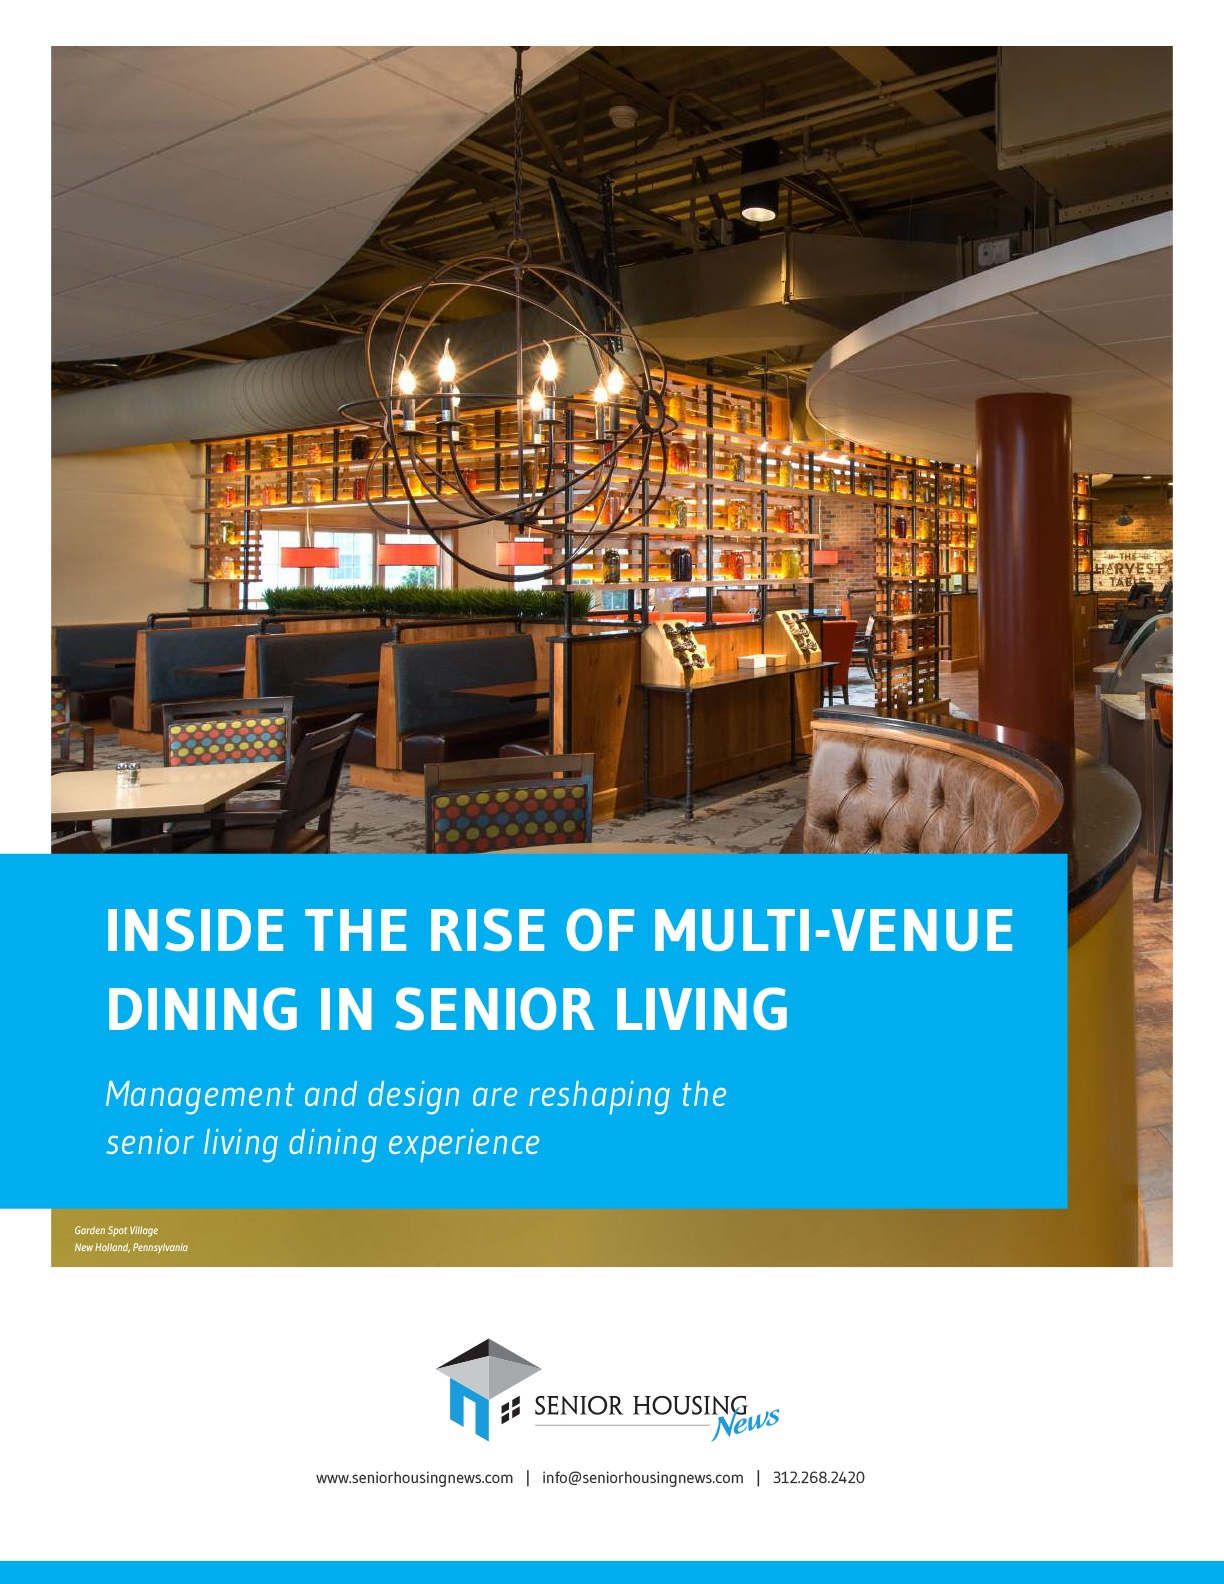 Inside The Rise of Multi-Venue Dining In Senior Living